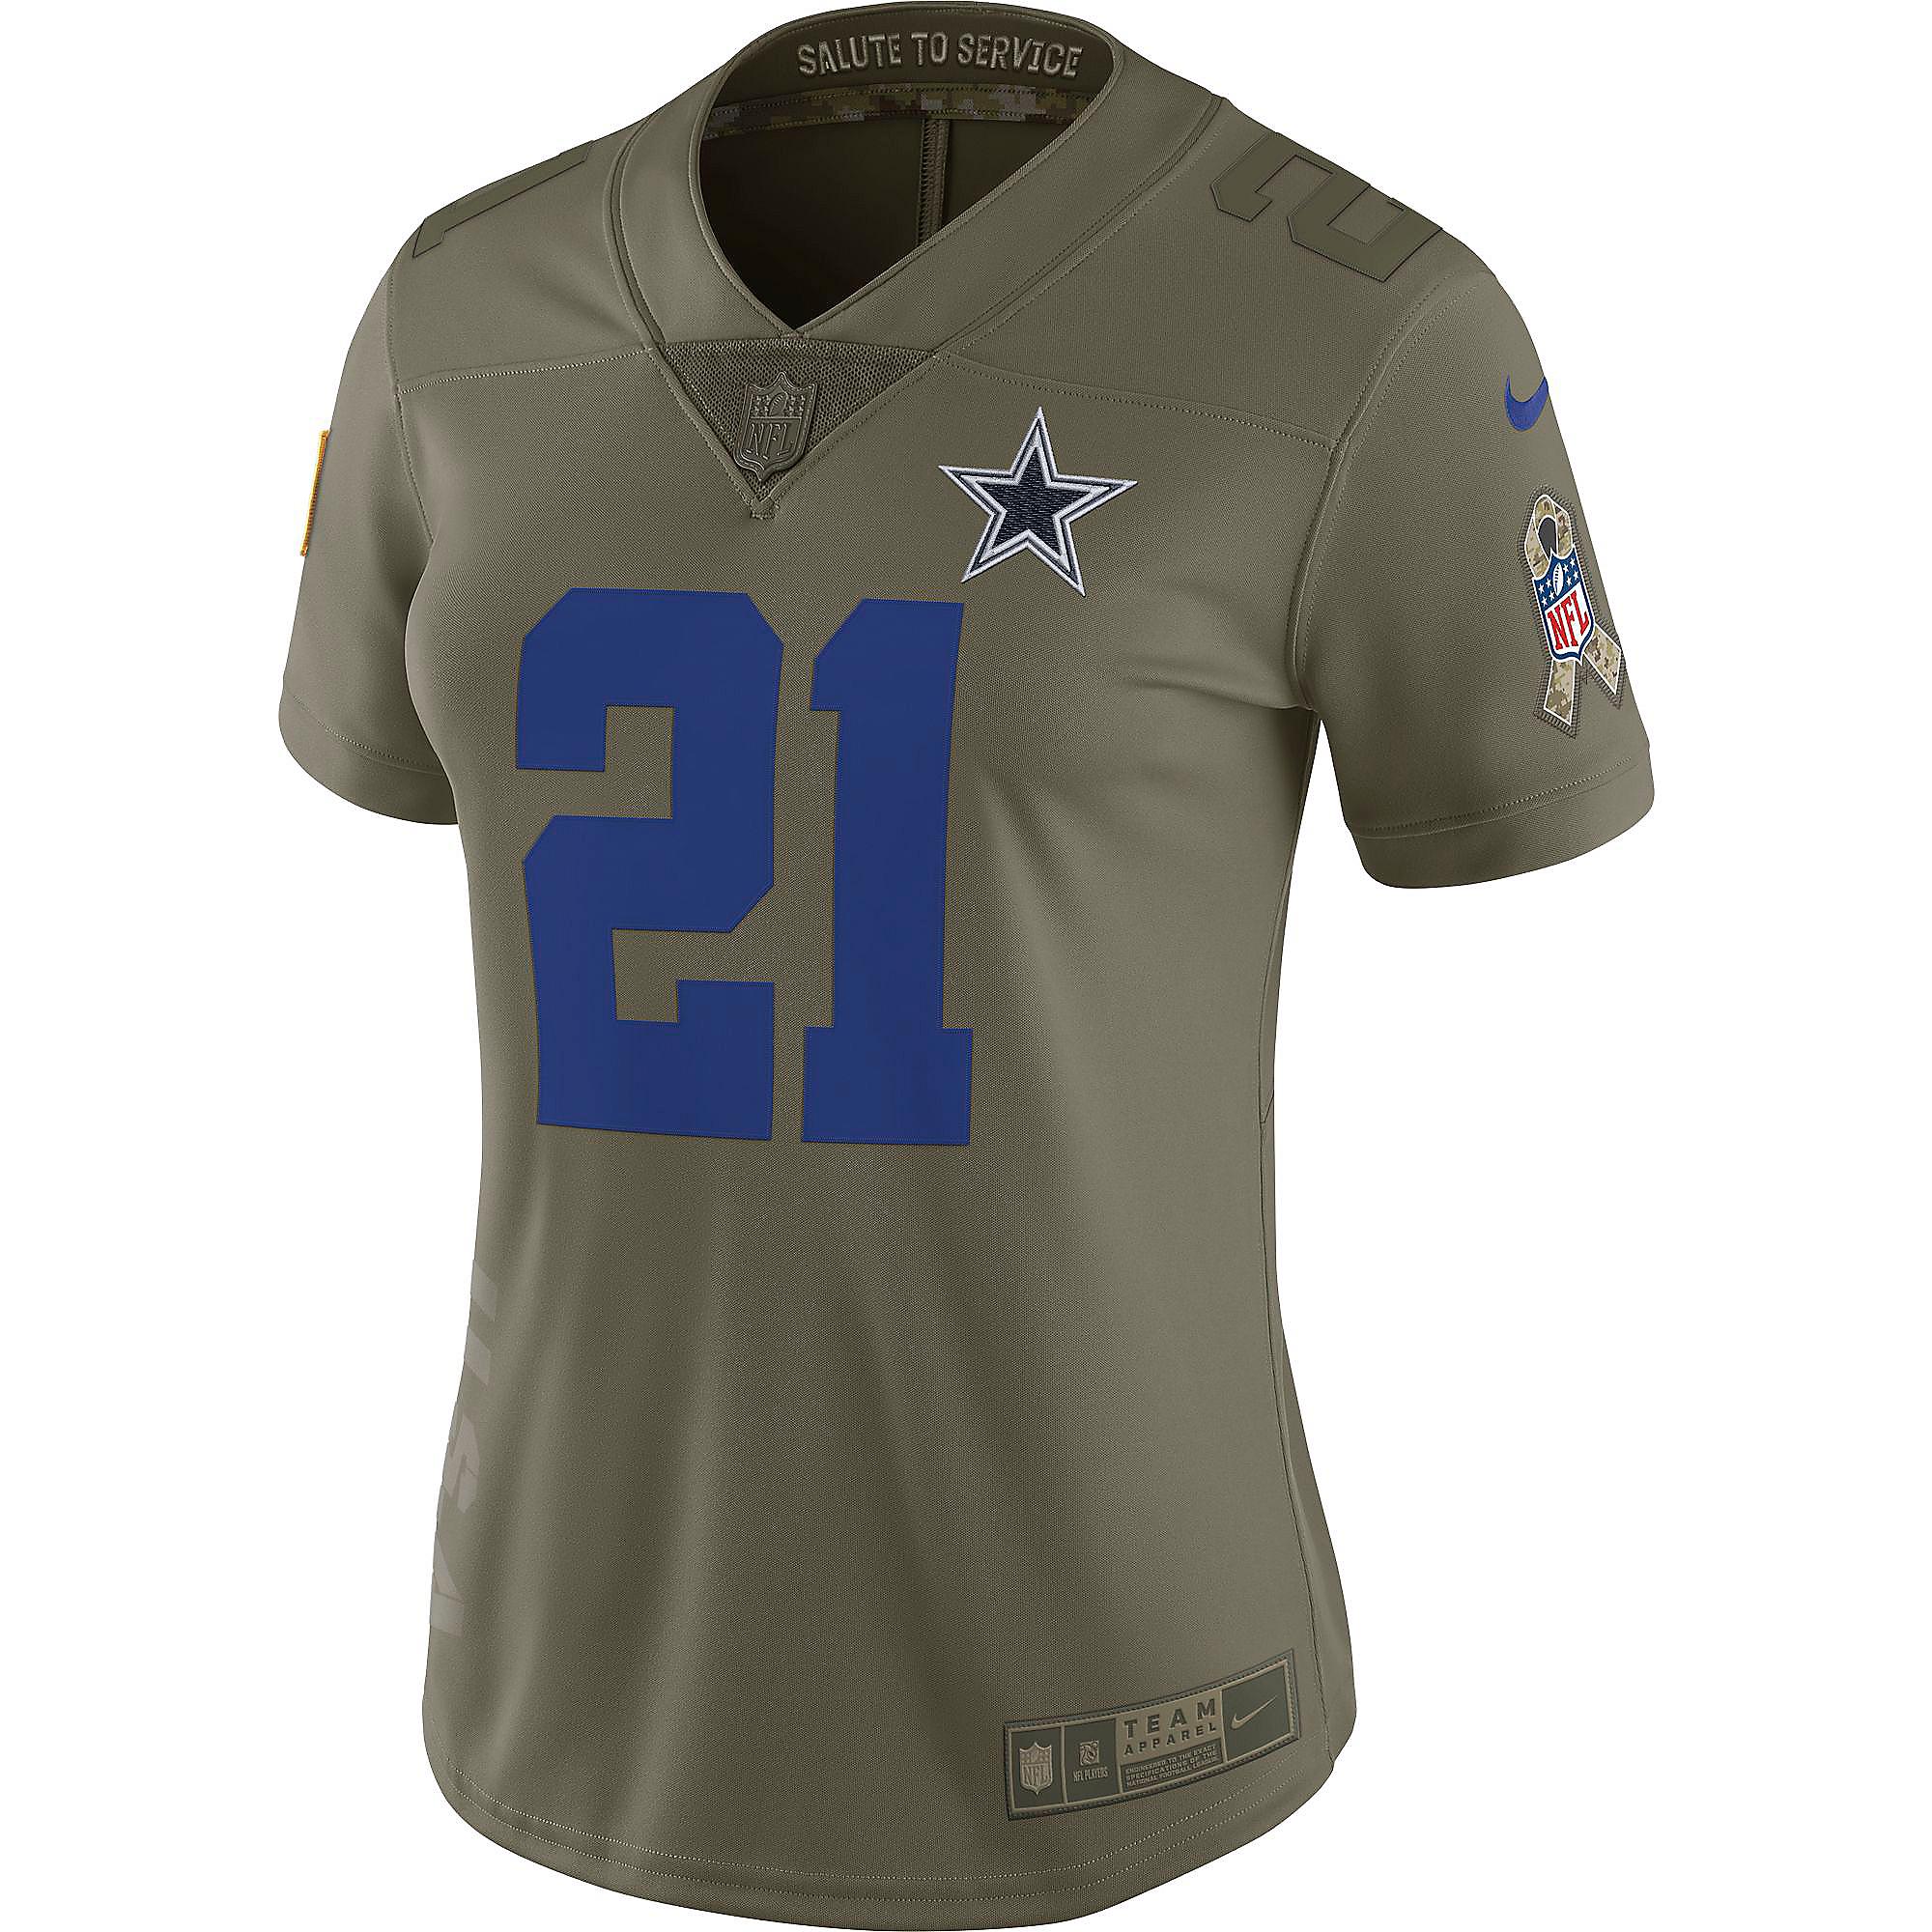 check out 51532 063f7 Dallas Cowboys Womens Ezekiel Elliott #21 Nike Limited Salute To Service  Jersey | Dallas Cowboys Pro Shop